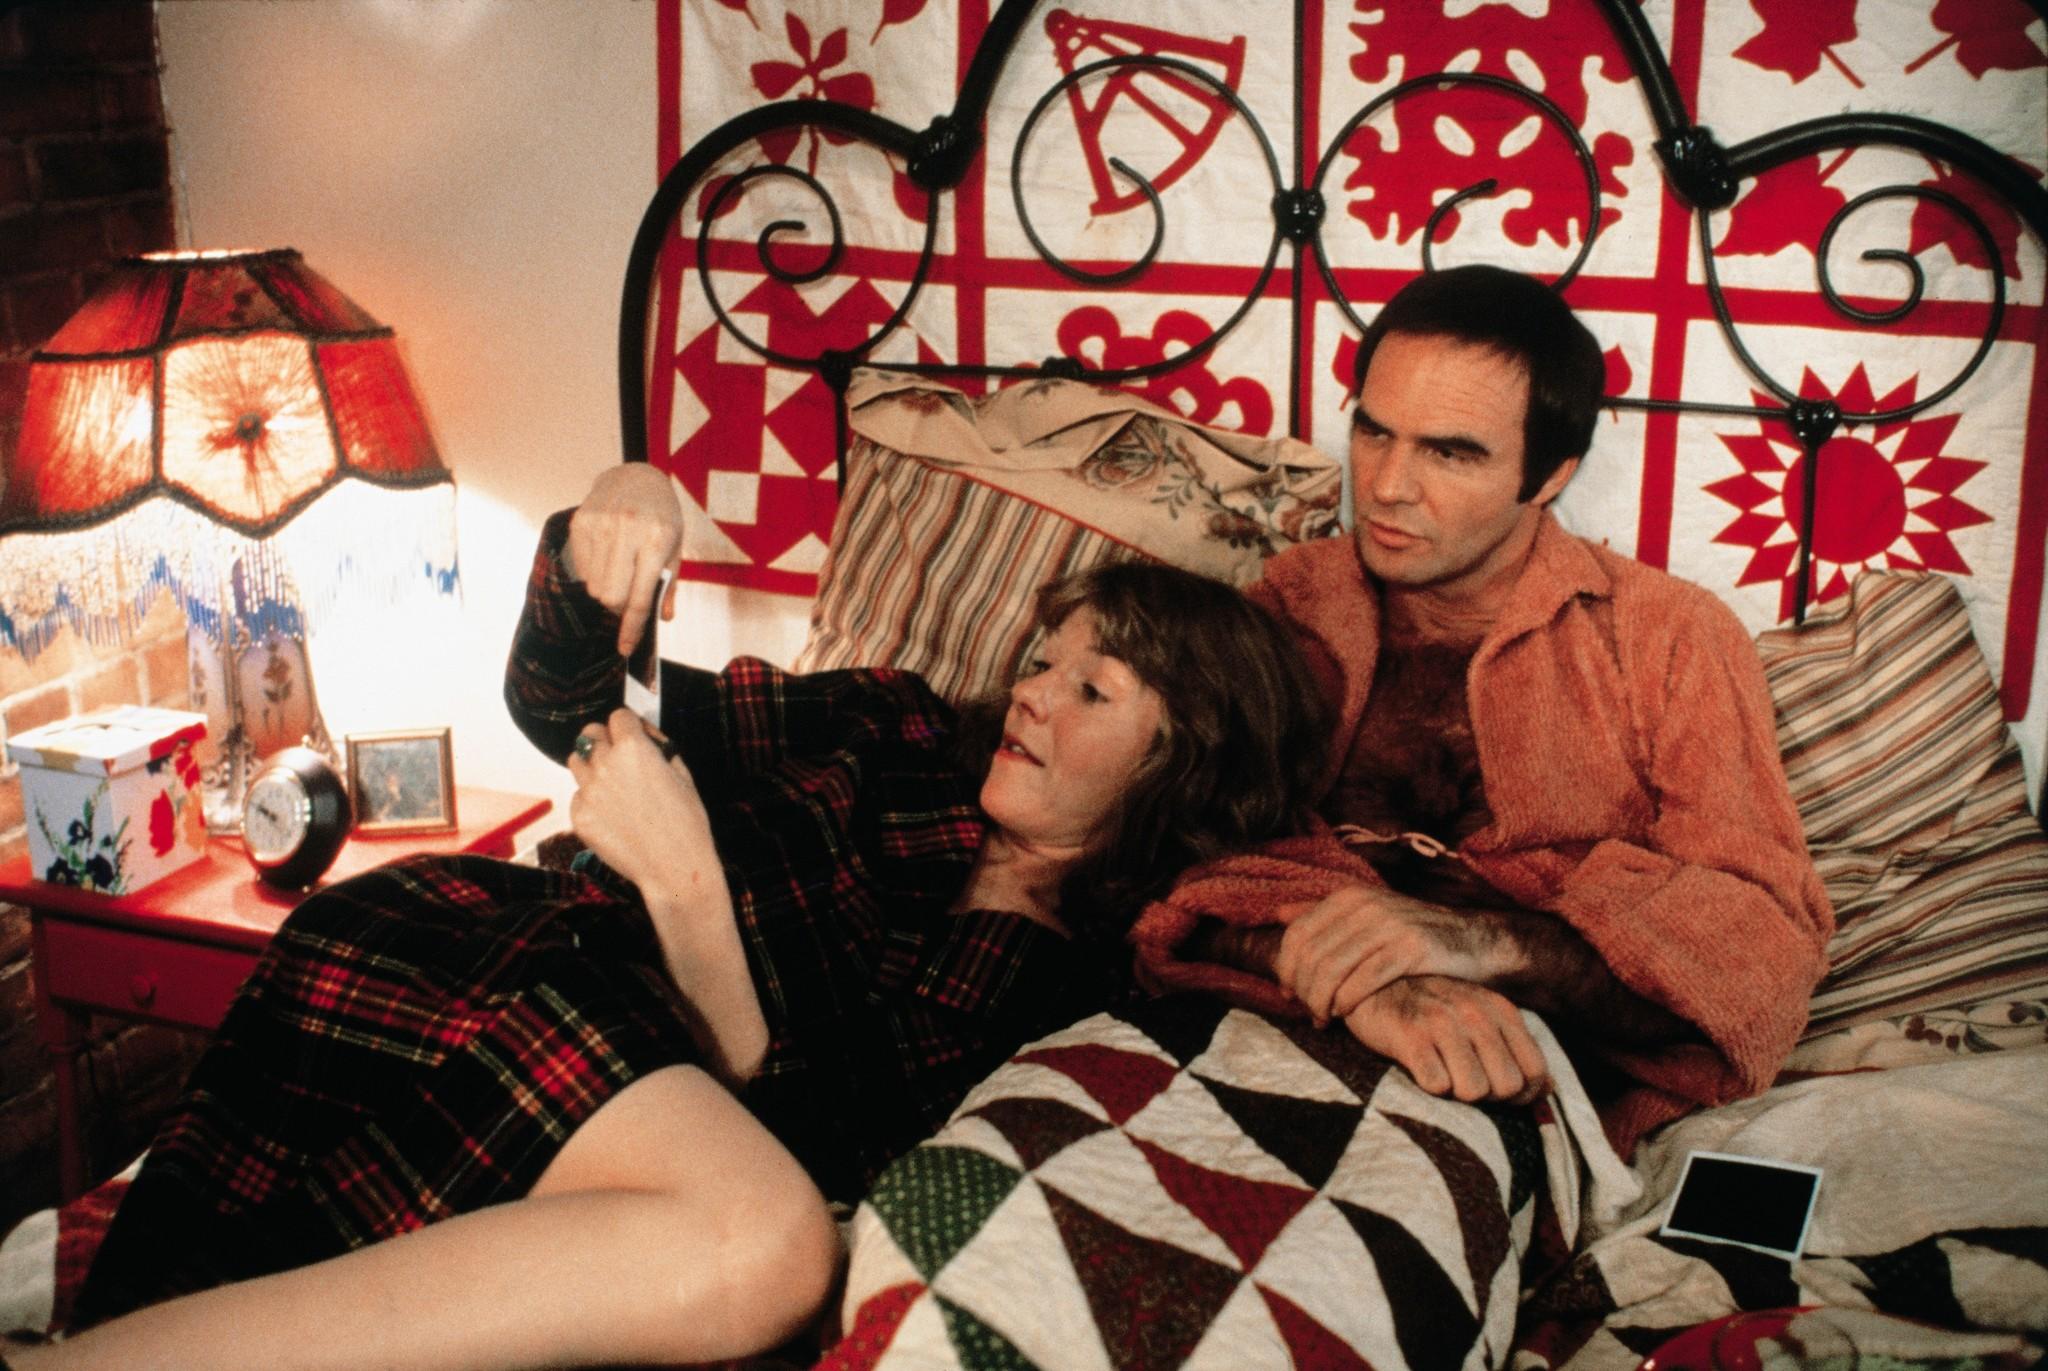 Still of Burt Reynolds and Jill Clayburgh in Starting Over (1979)